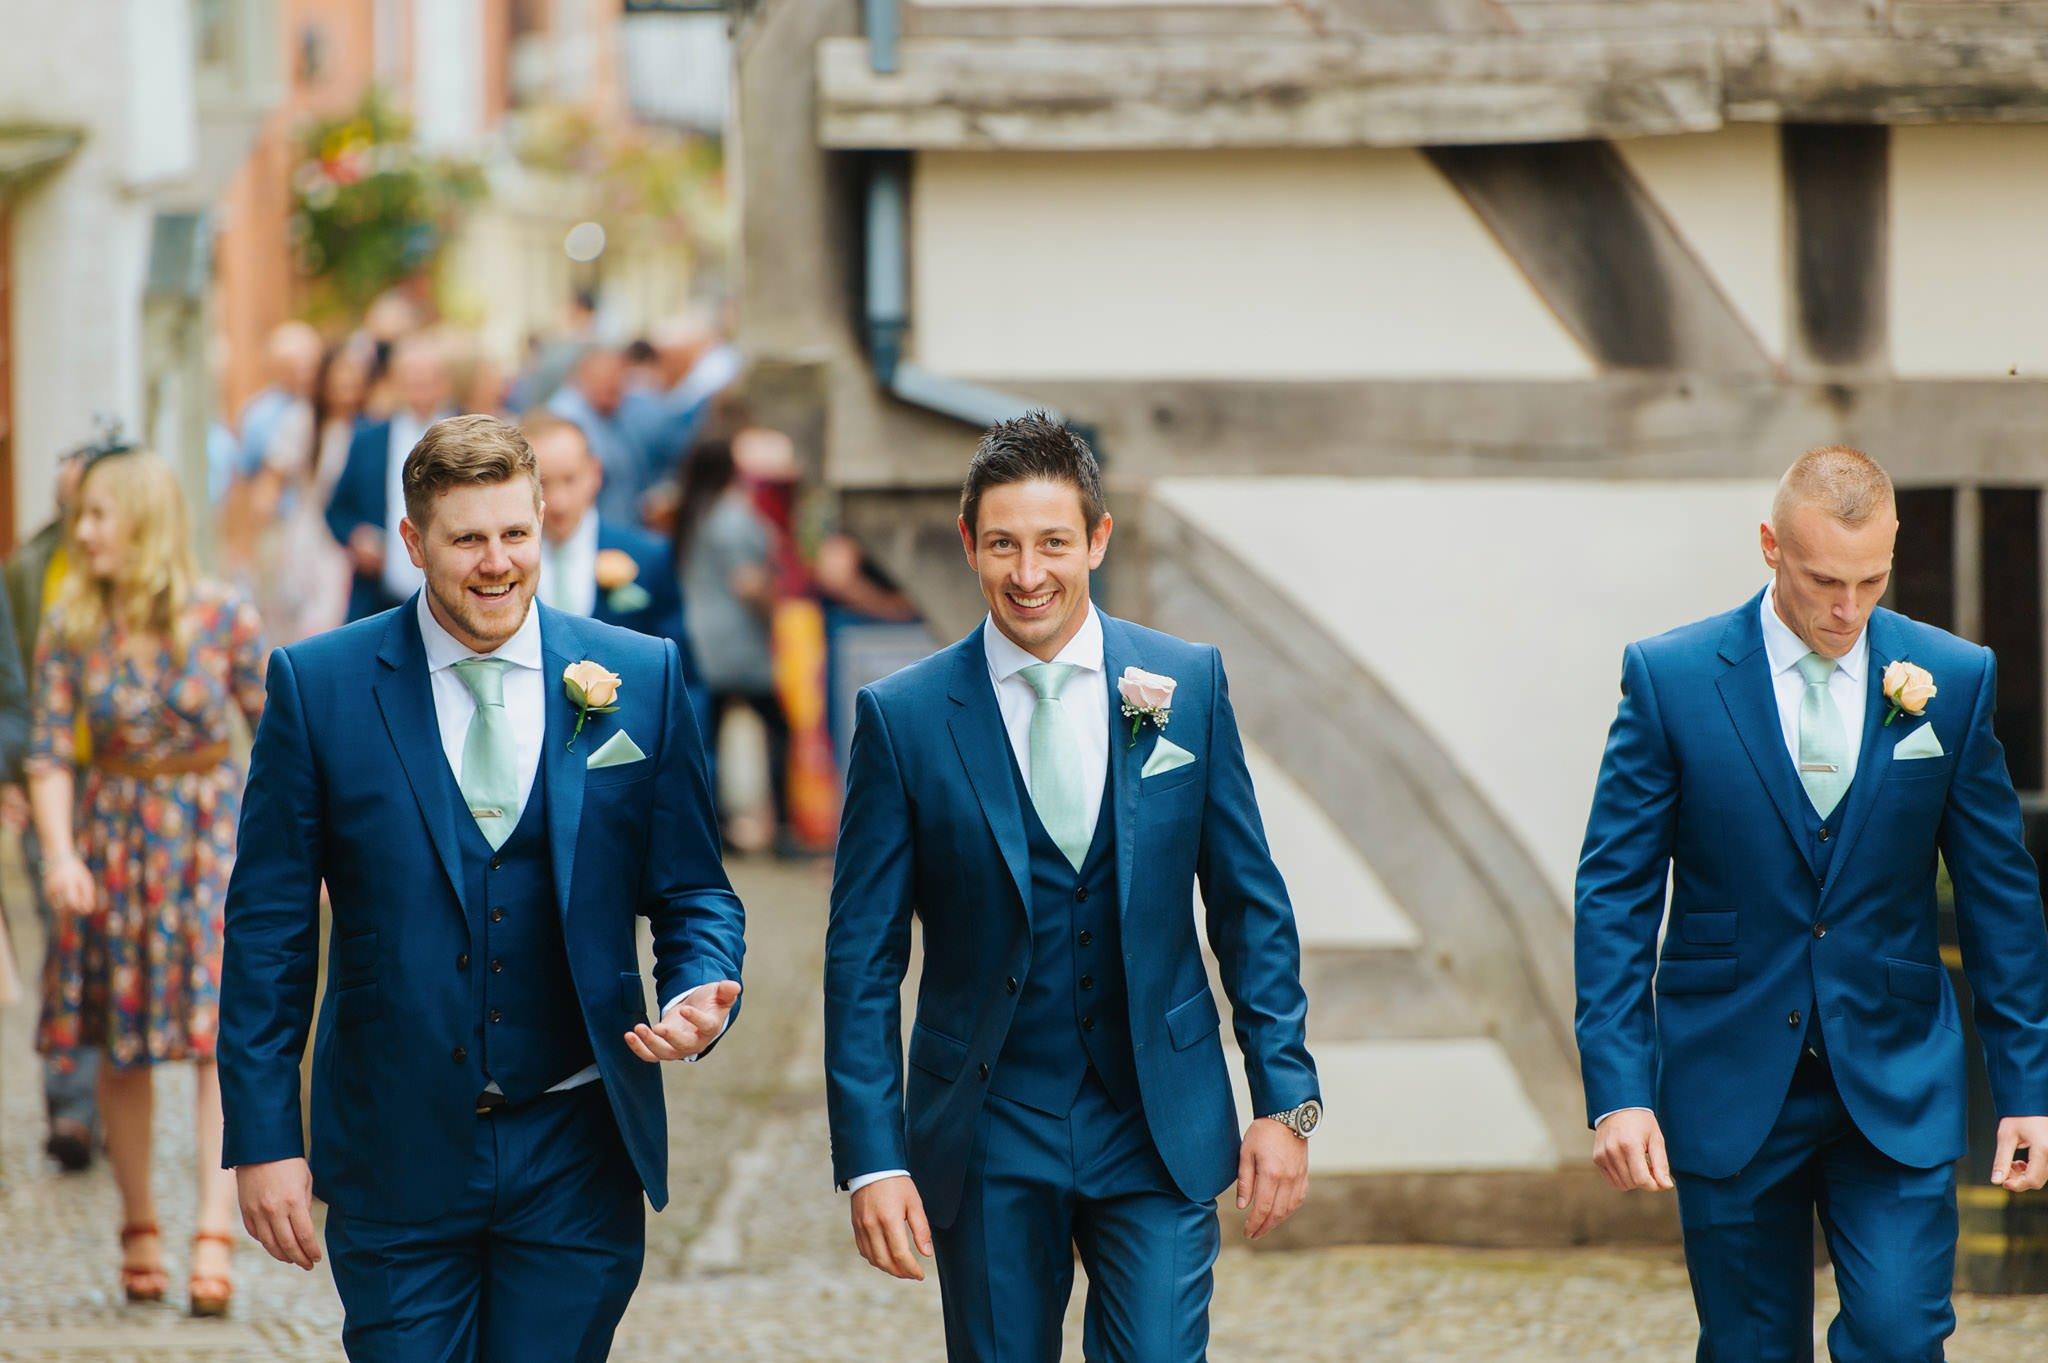 Eastnor Castle wedding photographer Herefordshire, West Midlands - Sarah + Dean 21